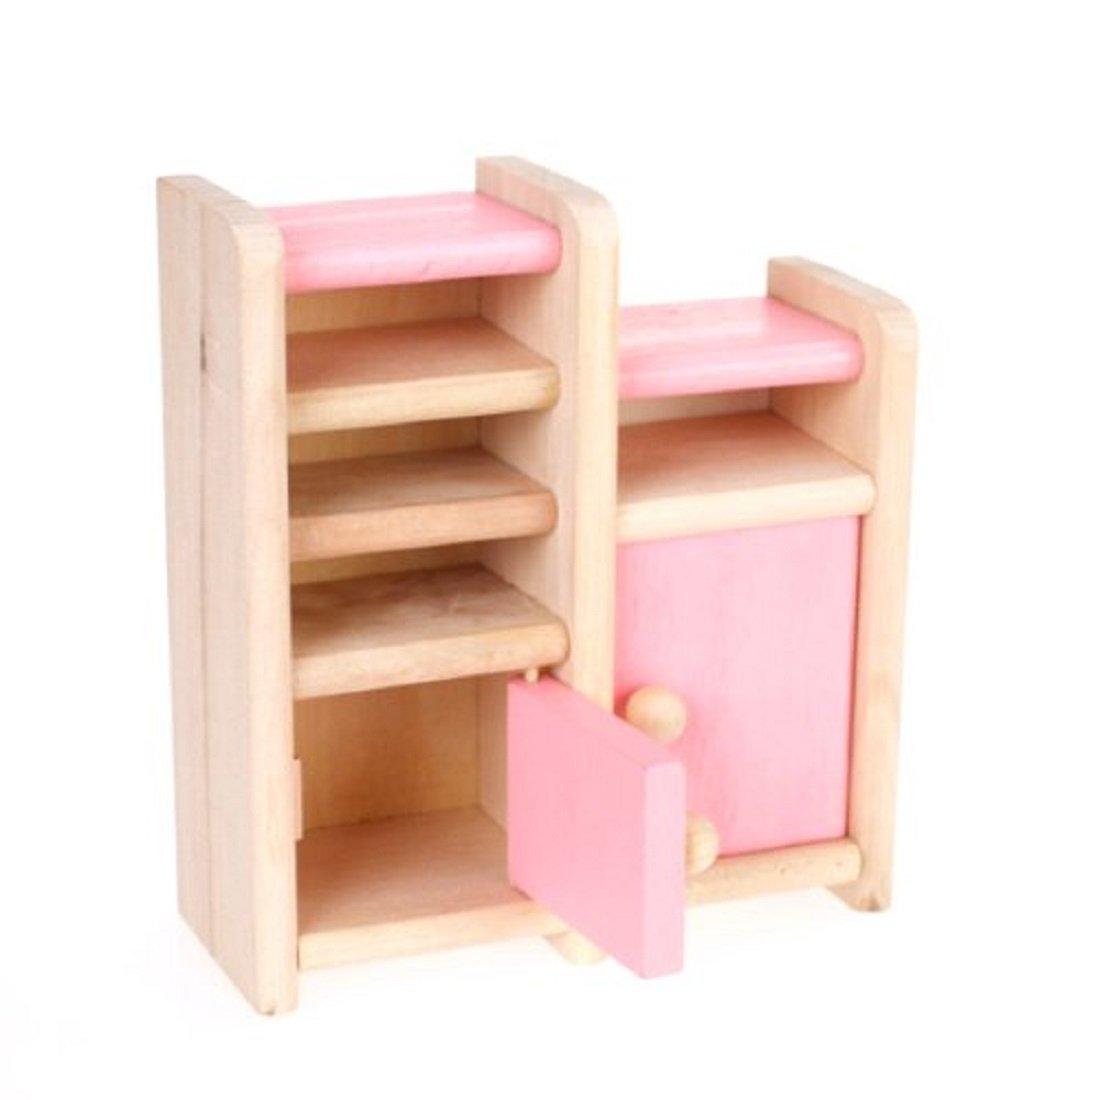 amazon com aisster tm wooden furniture dollhouse miniature pink amazon com aisster tm wooden furniture dollhouse miniature pink dining room set children toy toys games